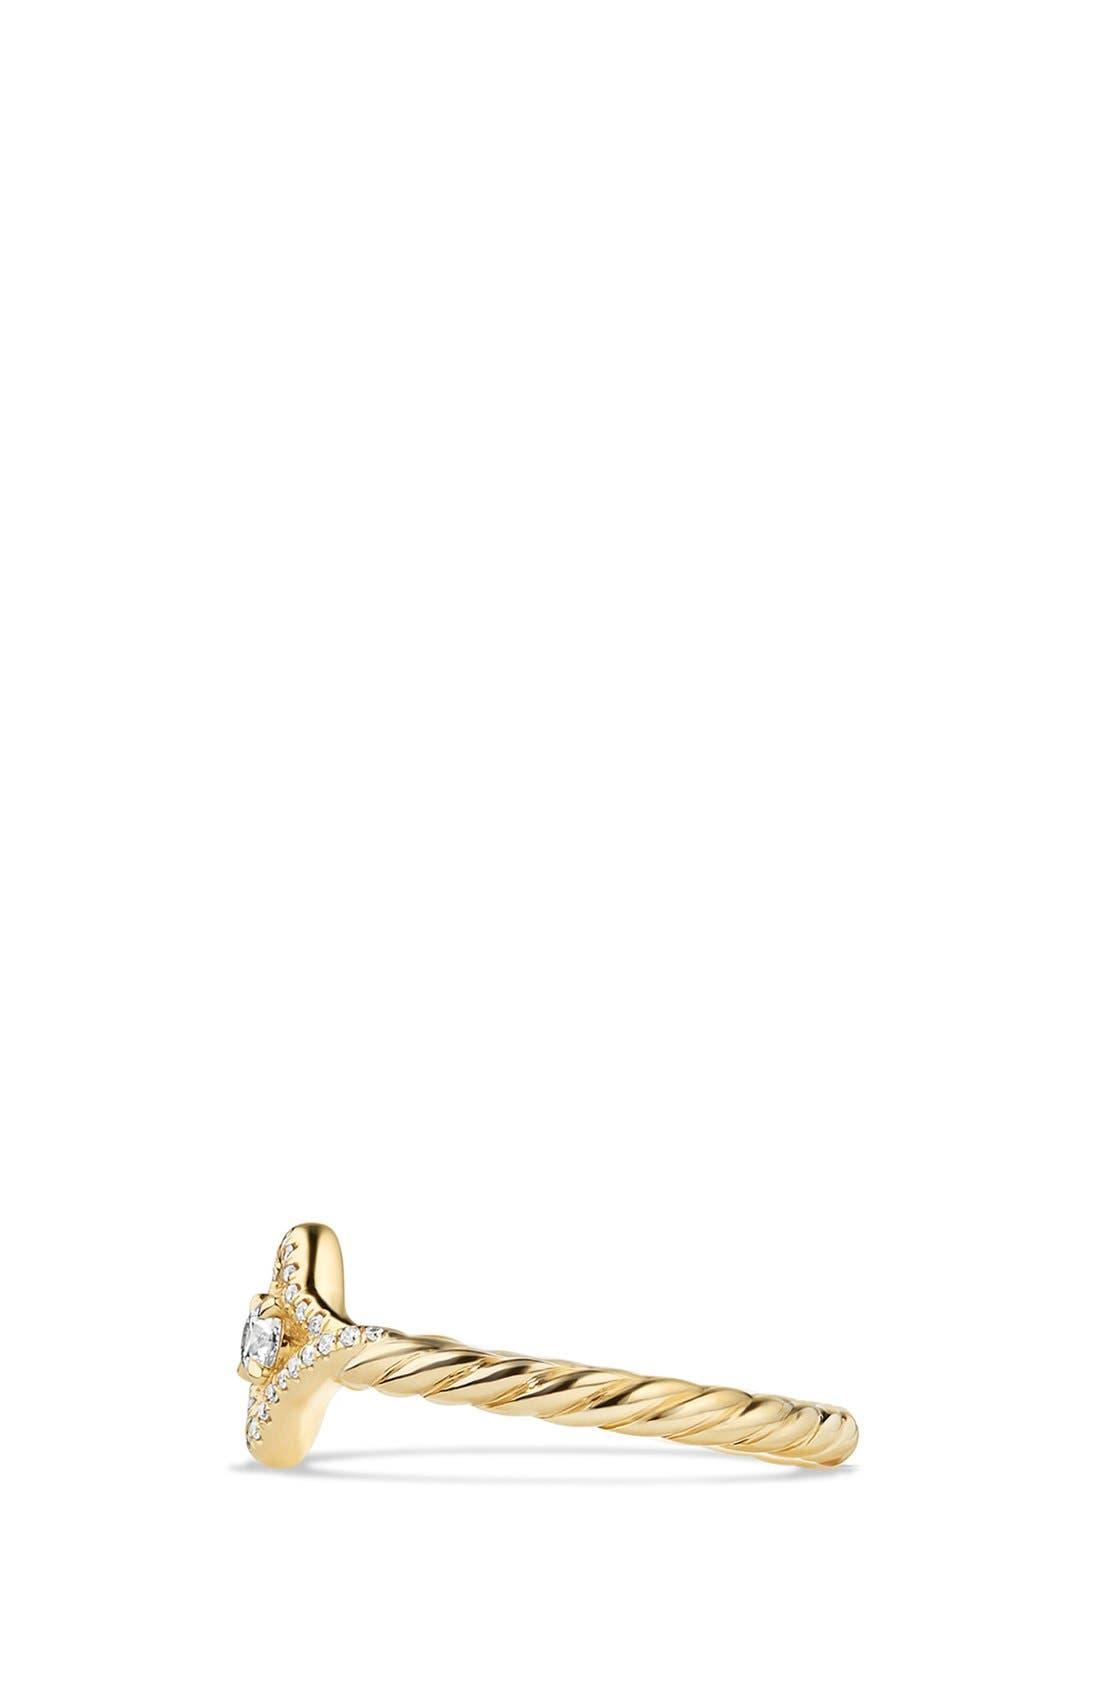 'Venetian Quatrefoil' Ring with Diamonds,                             Alternate thumbnail 3, color,                             YELLOW GOLD